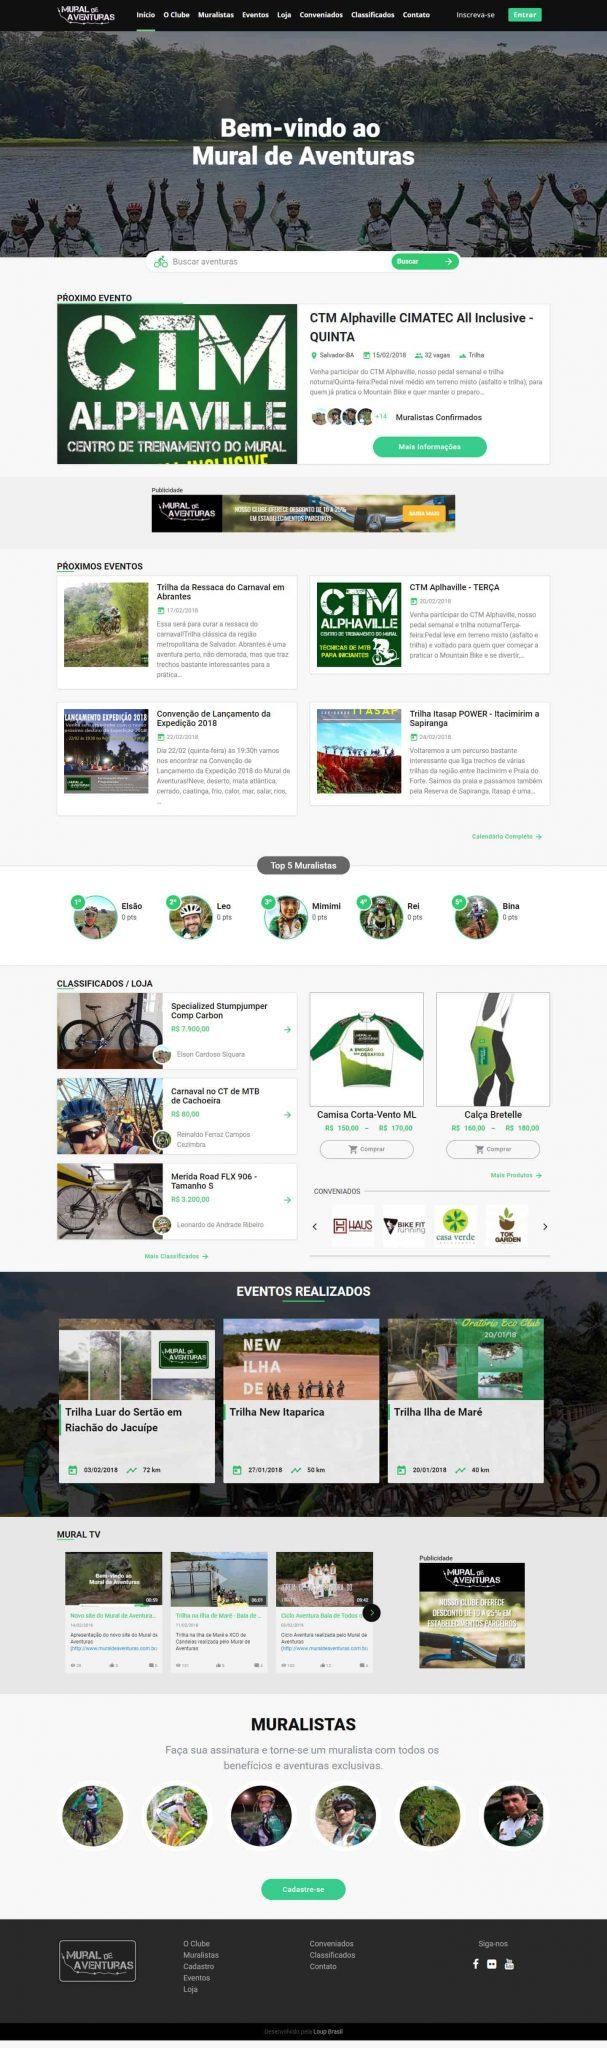 Print da página principal do Clube de Ciclismo e Aventuras, Mural de Aventuras.